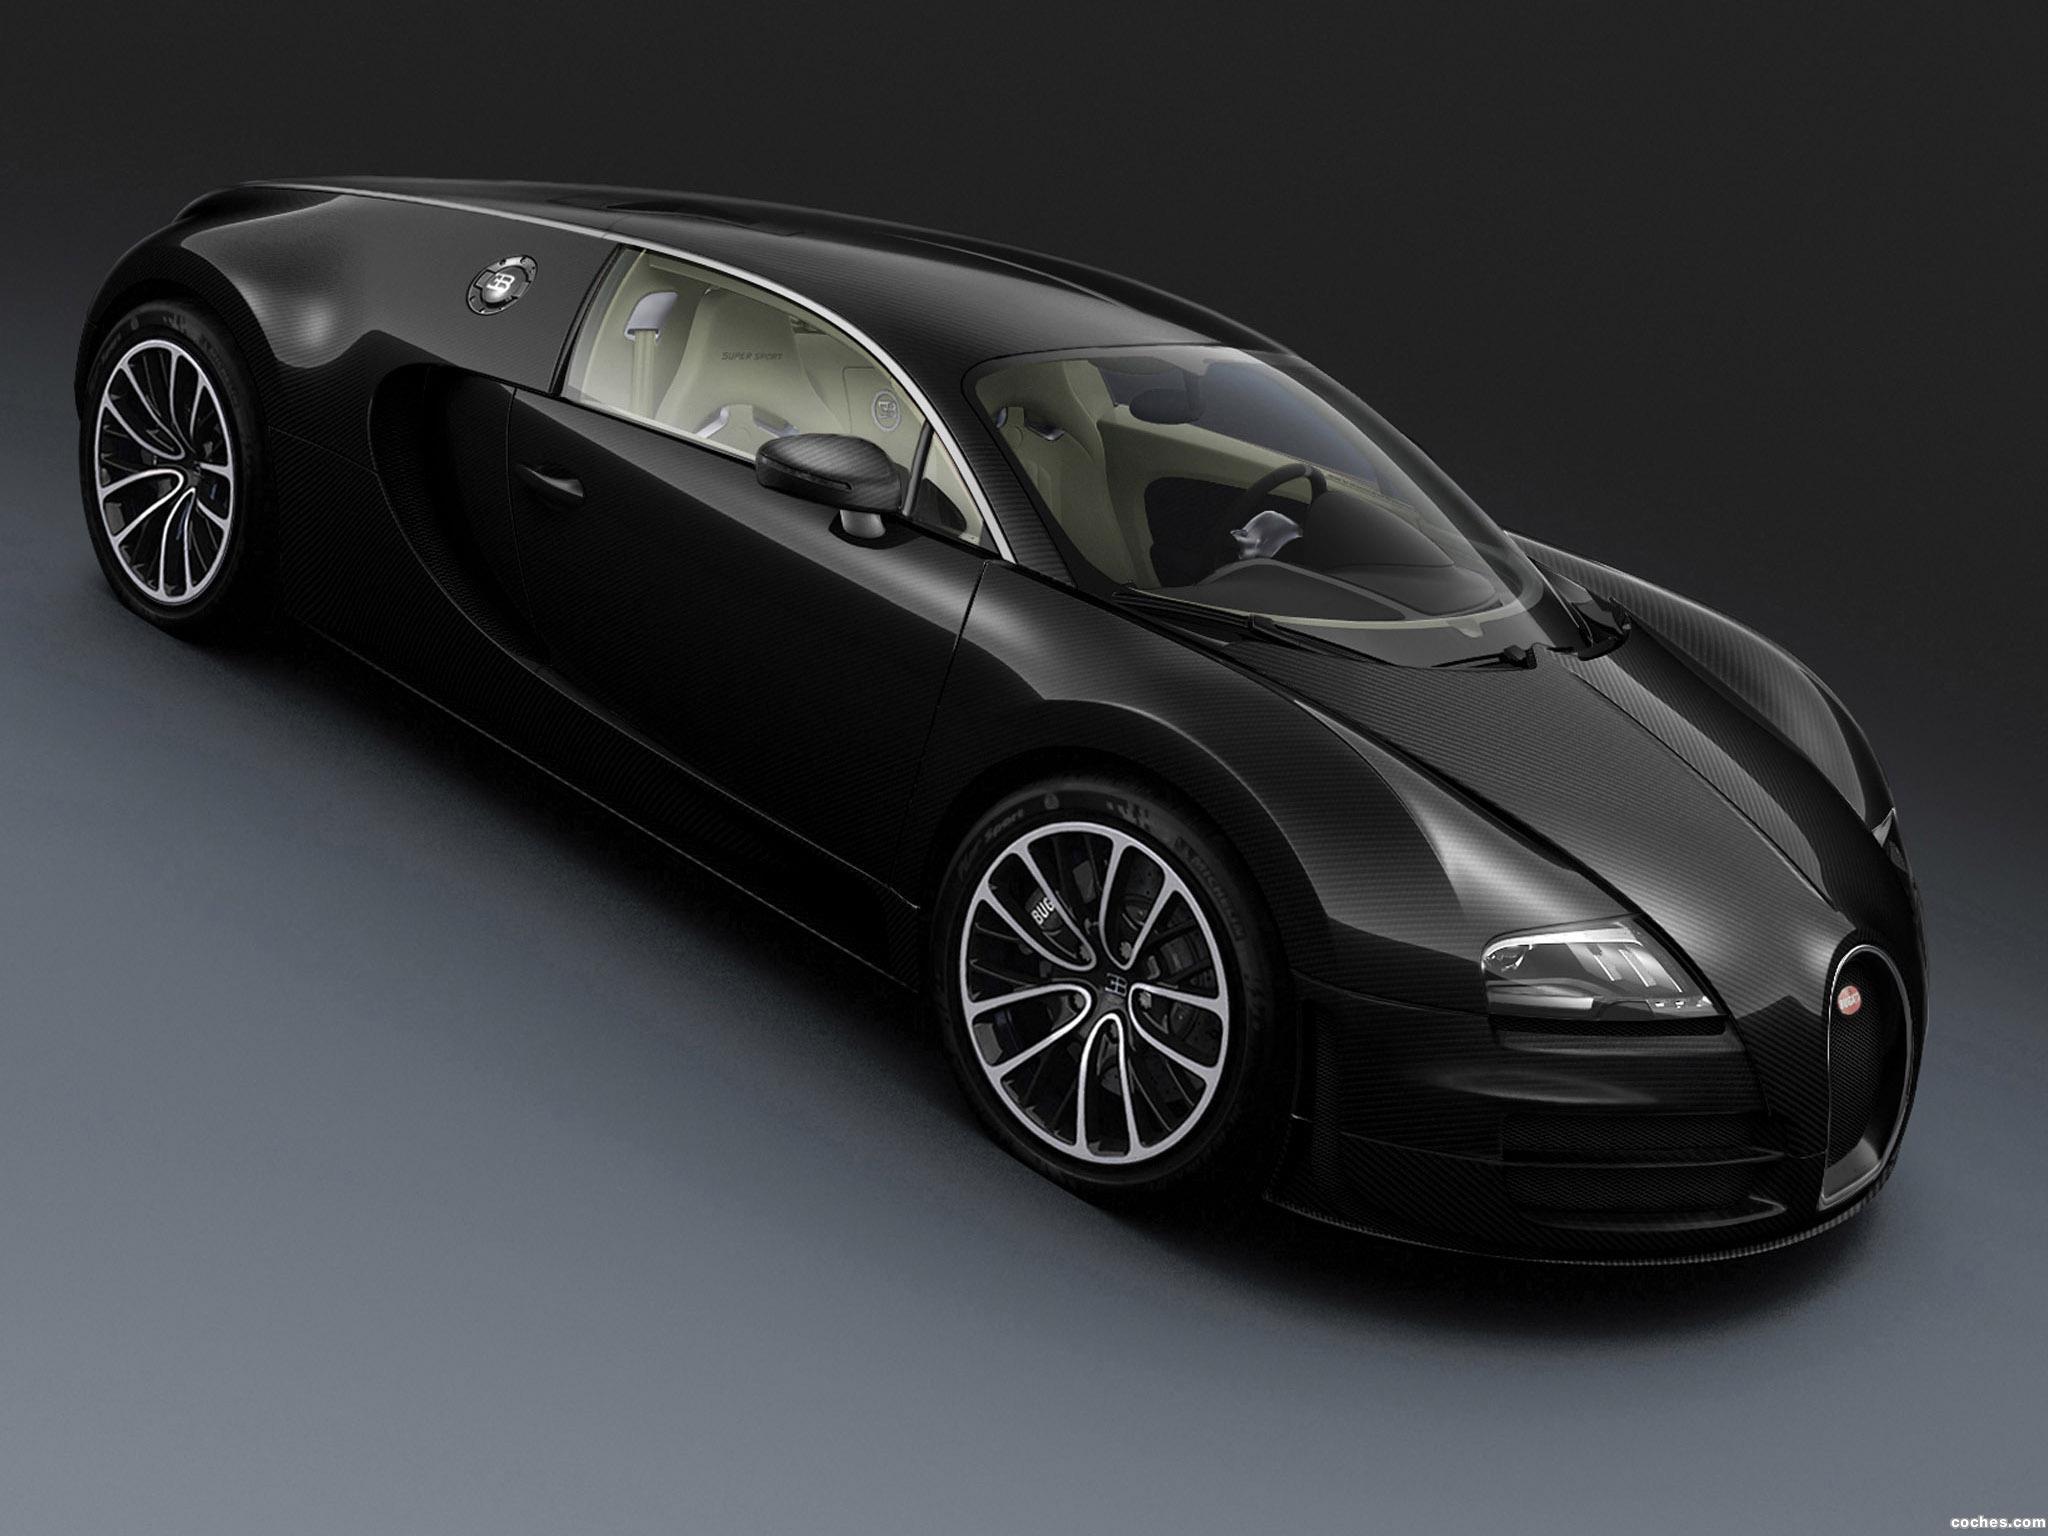 Foto 0 de Bugatti Veyron Super Sport Shanghai Edition 2011